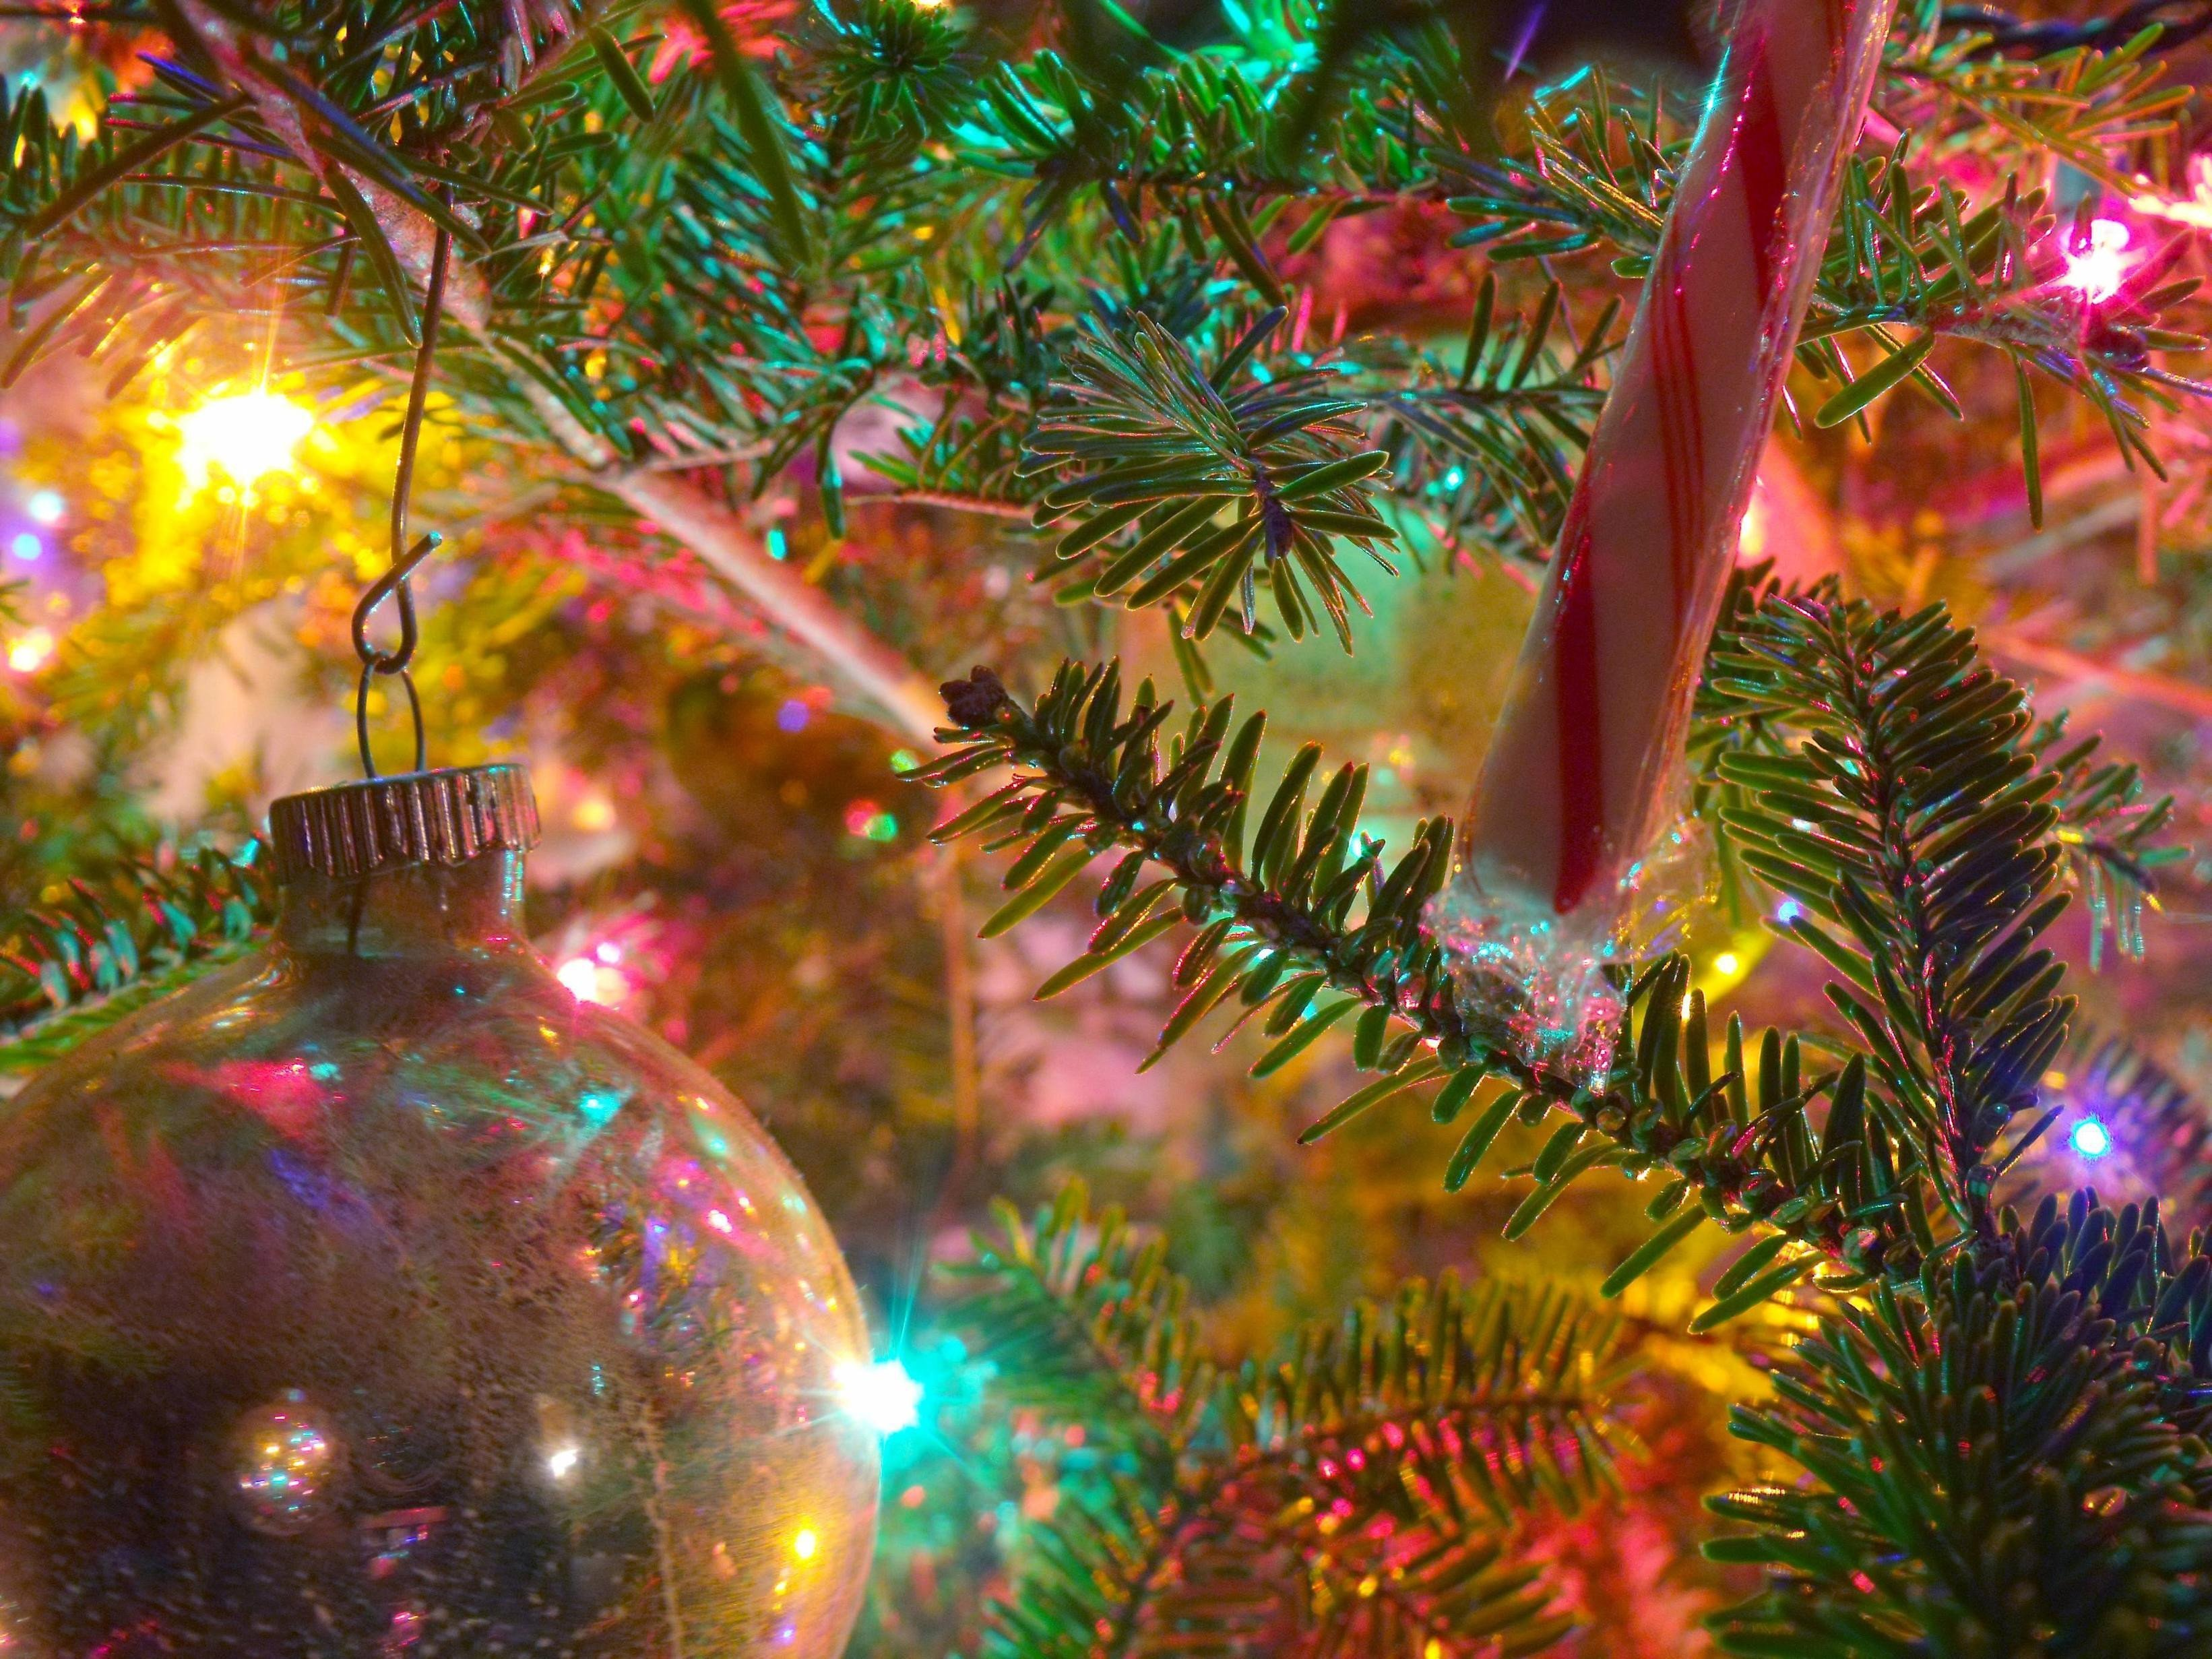 Free Christmas Desktop Wallpaper Christmas Wallpapers for Puter Desktop Wallpaper Cave